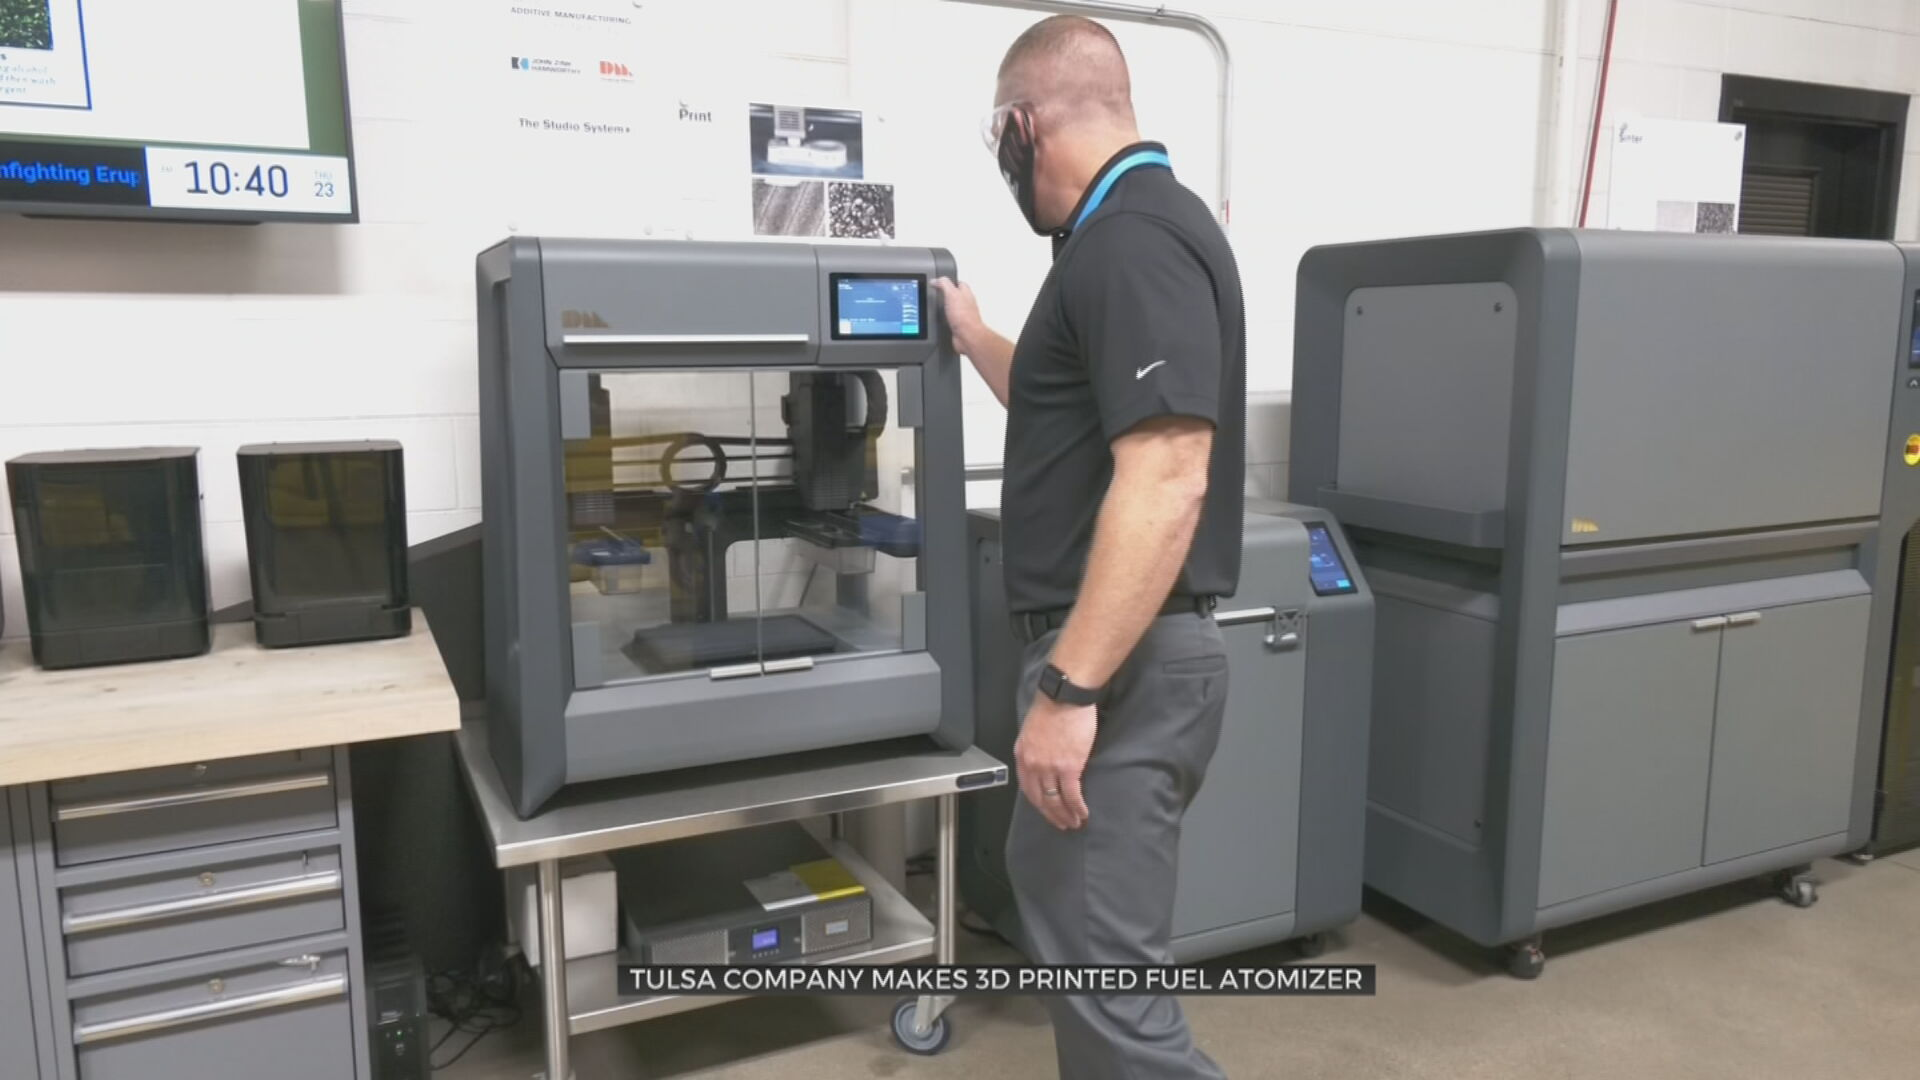 Tulsa Company Makes 3D Printed Fuel Atomizer